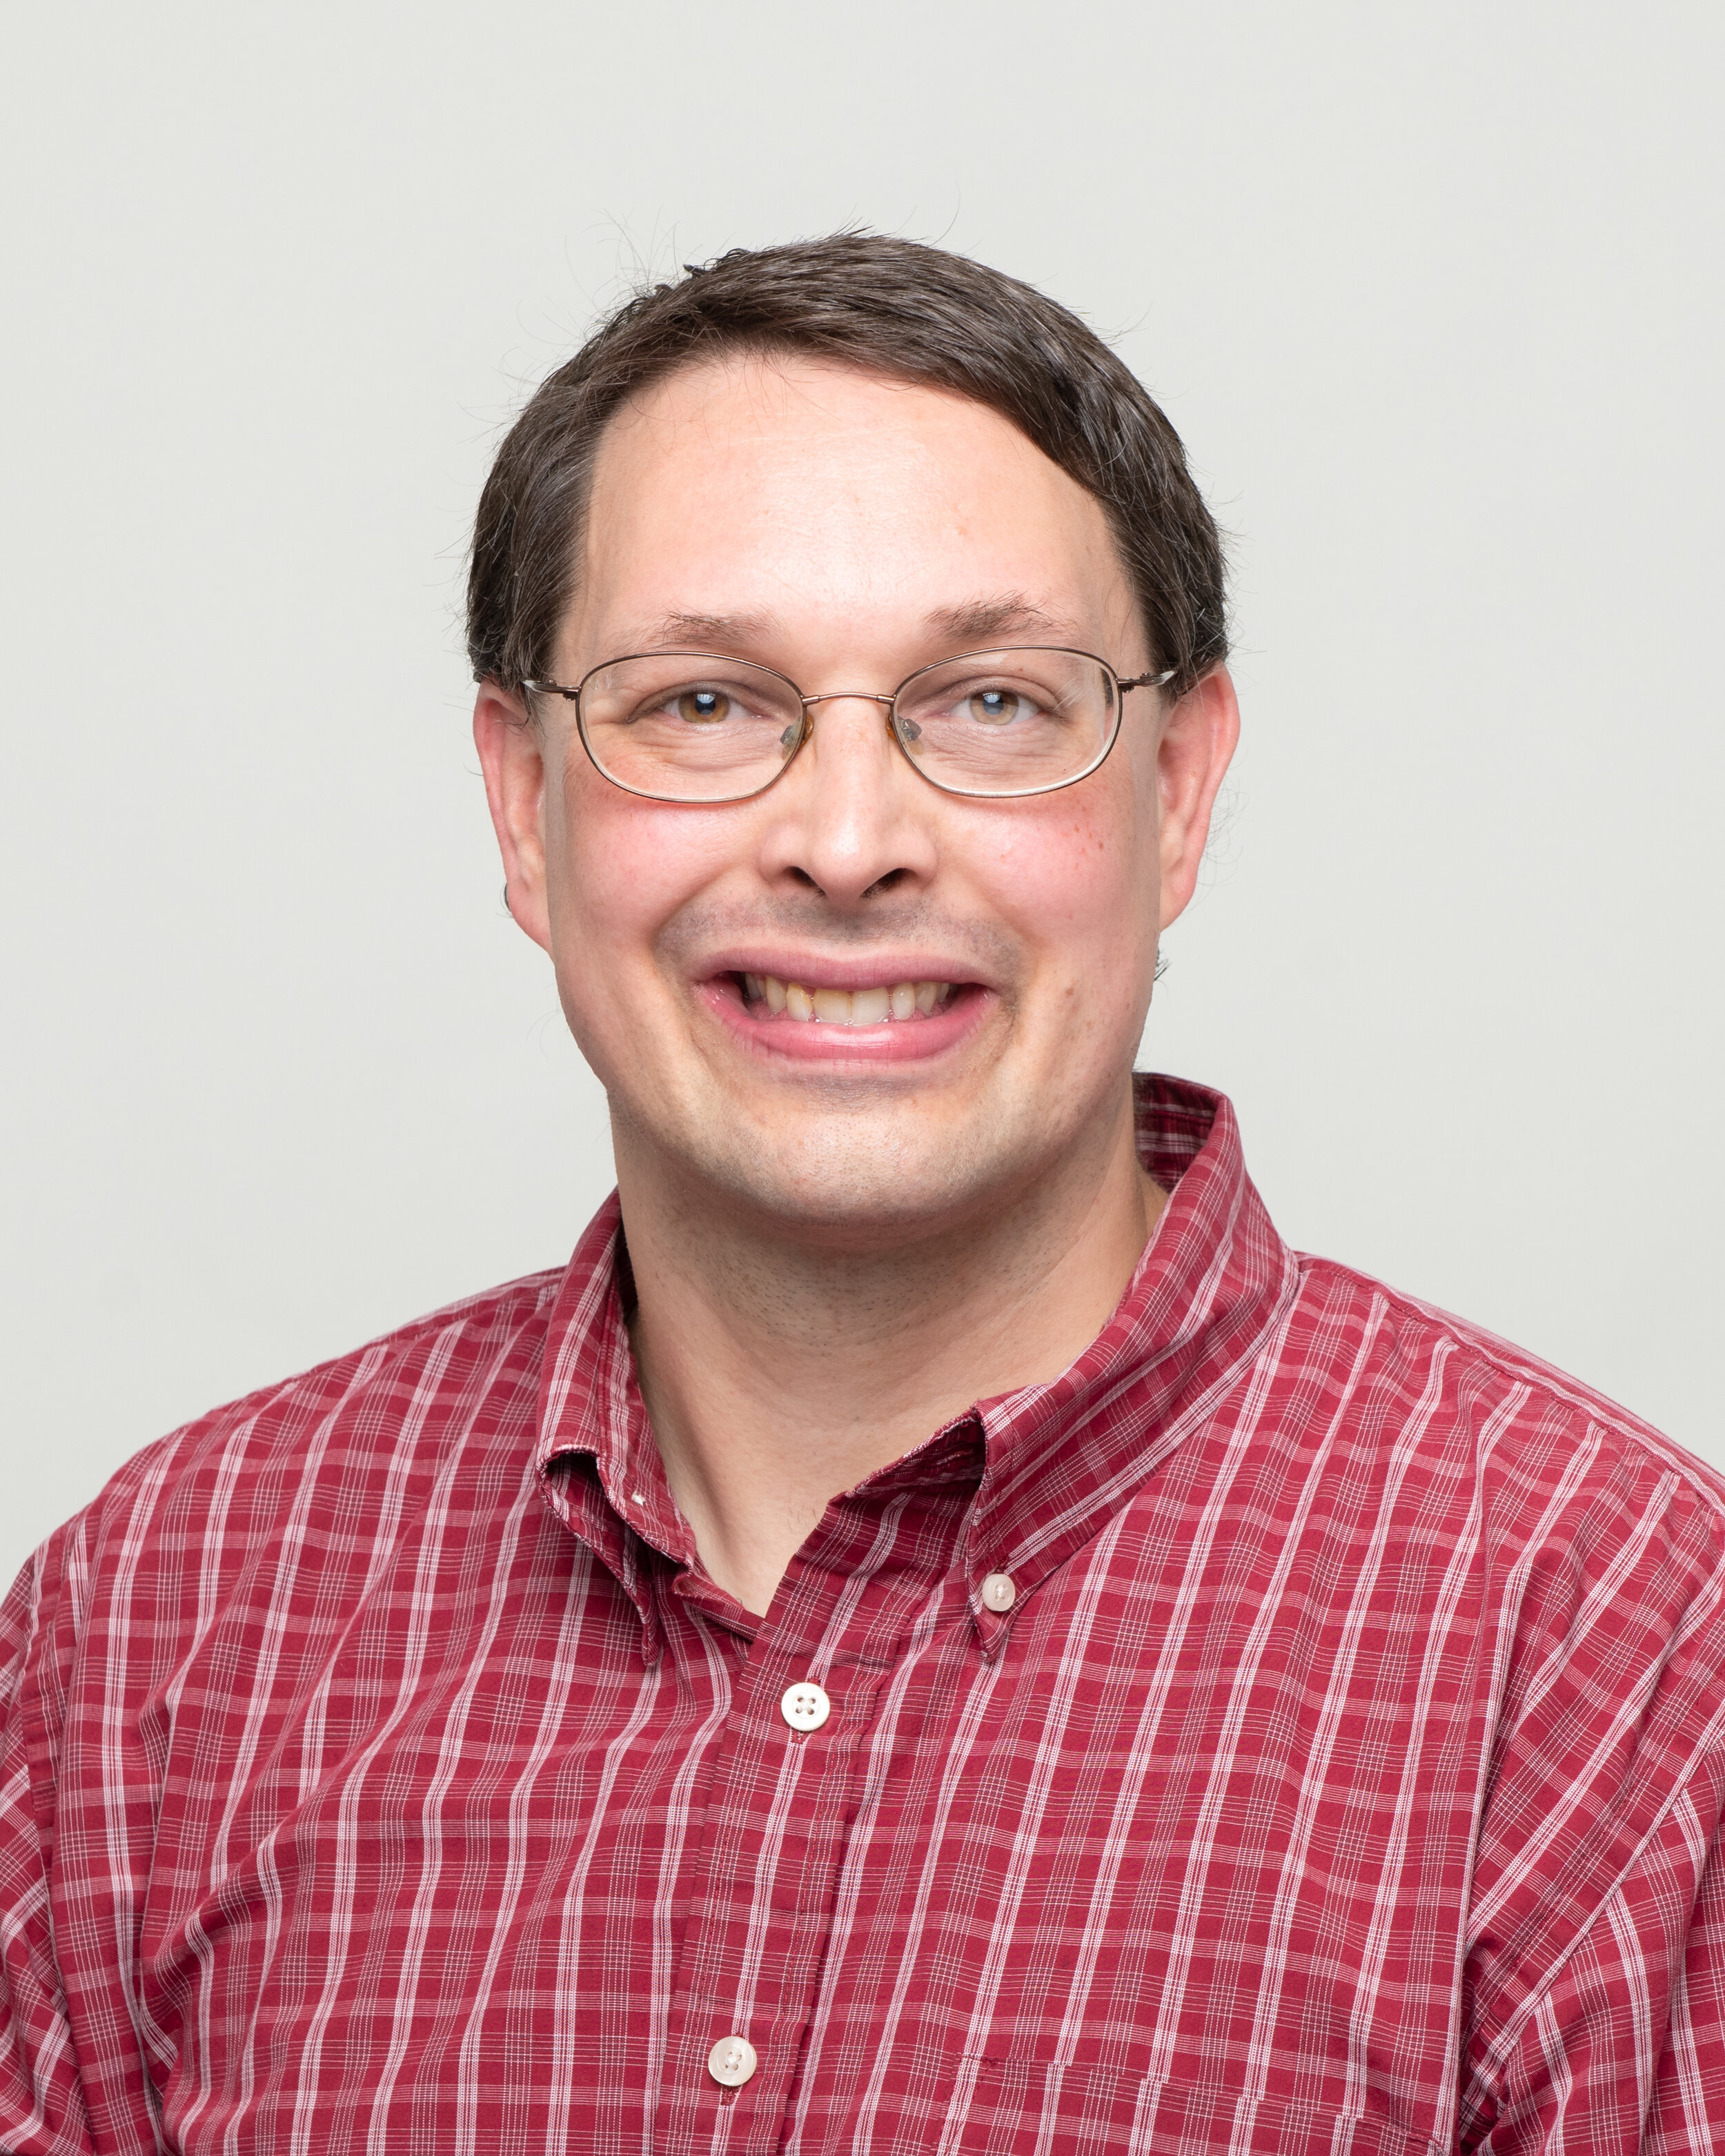 Dr. Daniel Kiteck